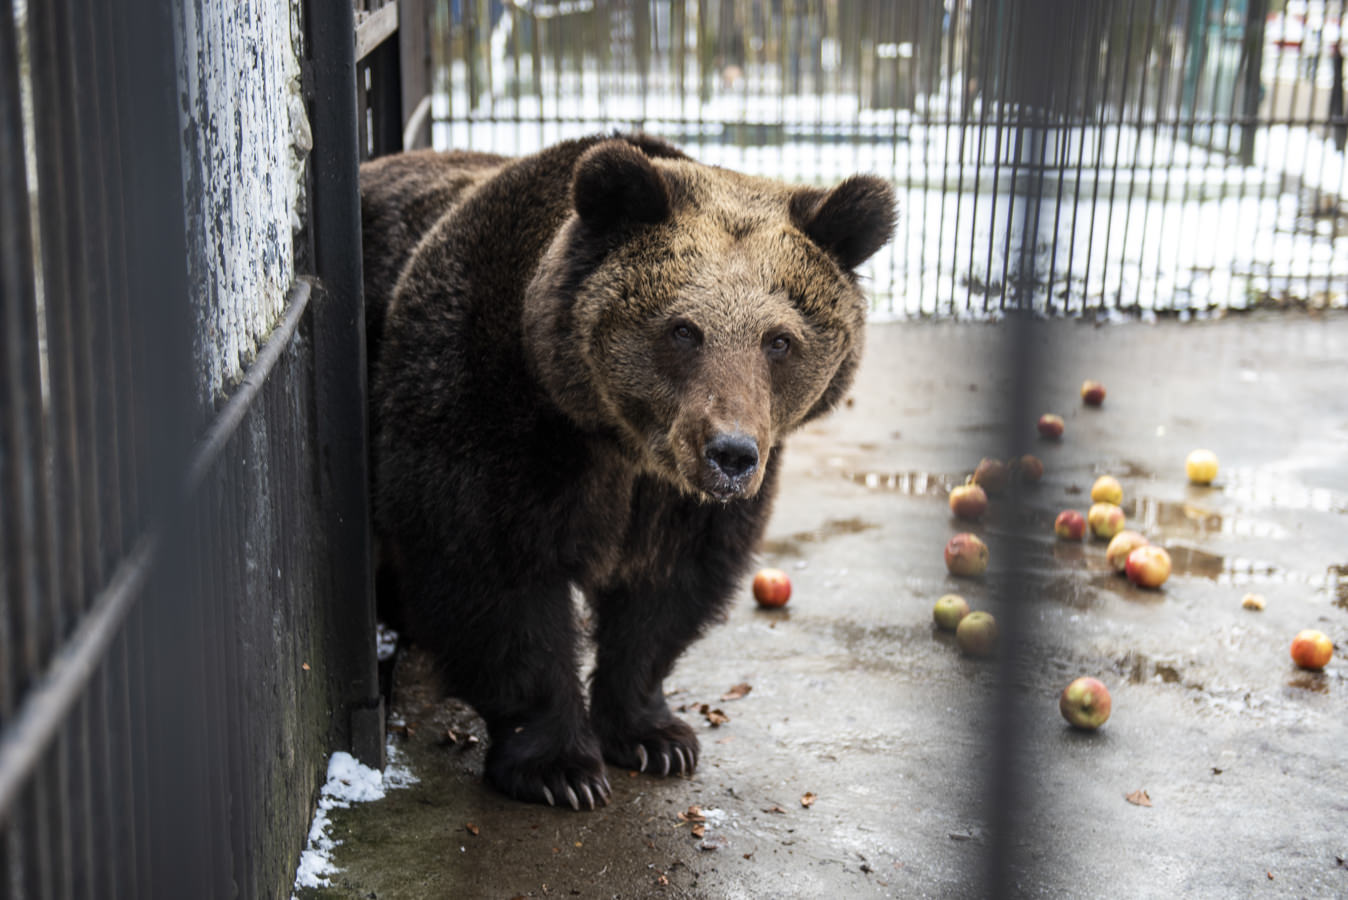 O plimbare prin Parcul Zoo de la Rădăuți (fotoreportaj)